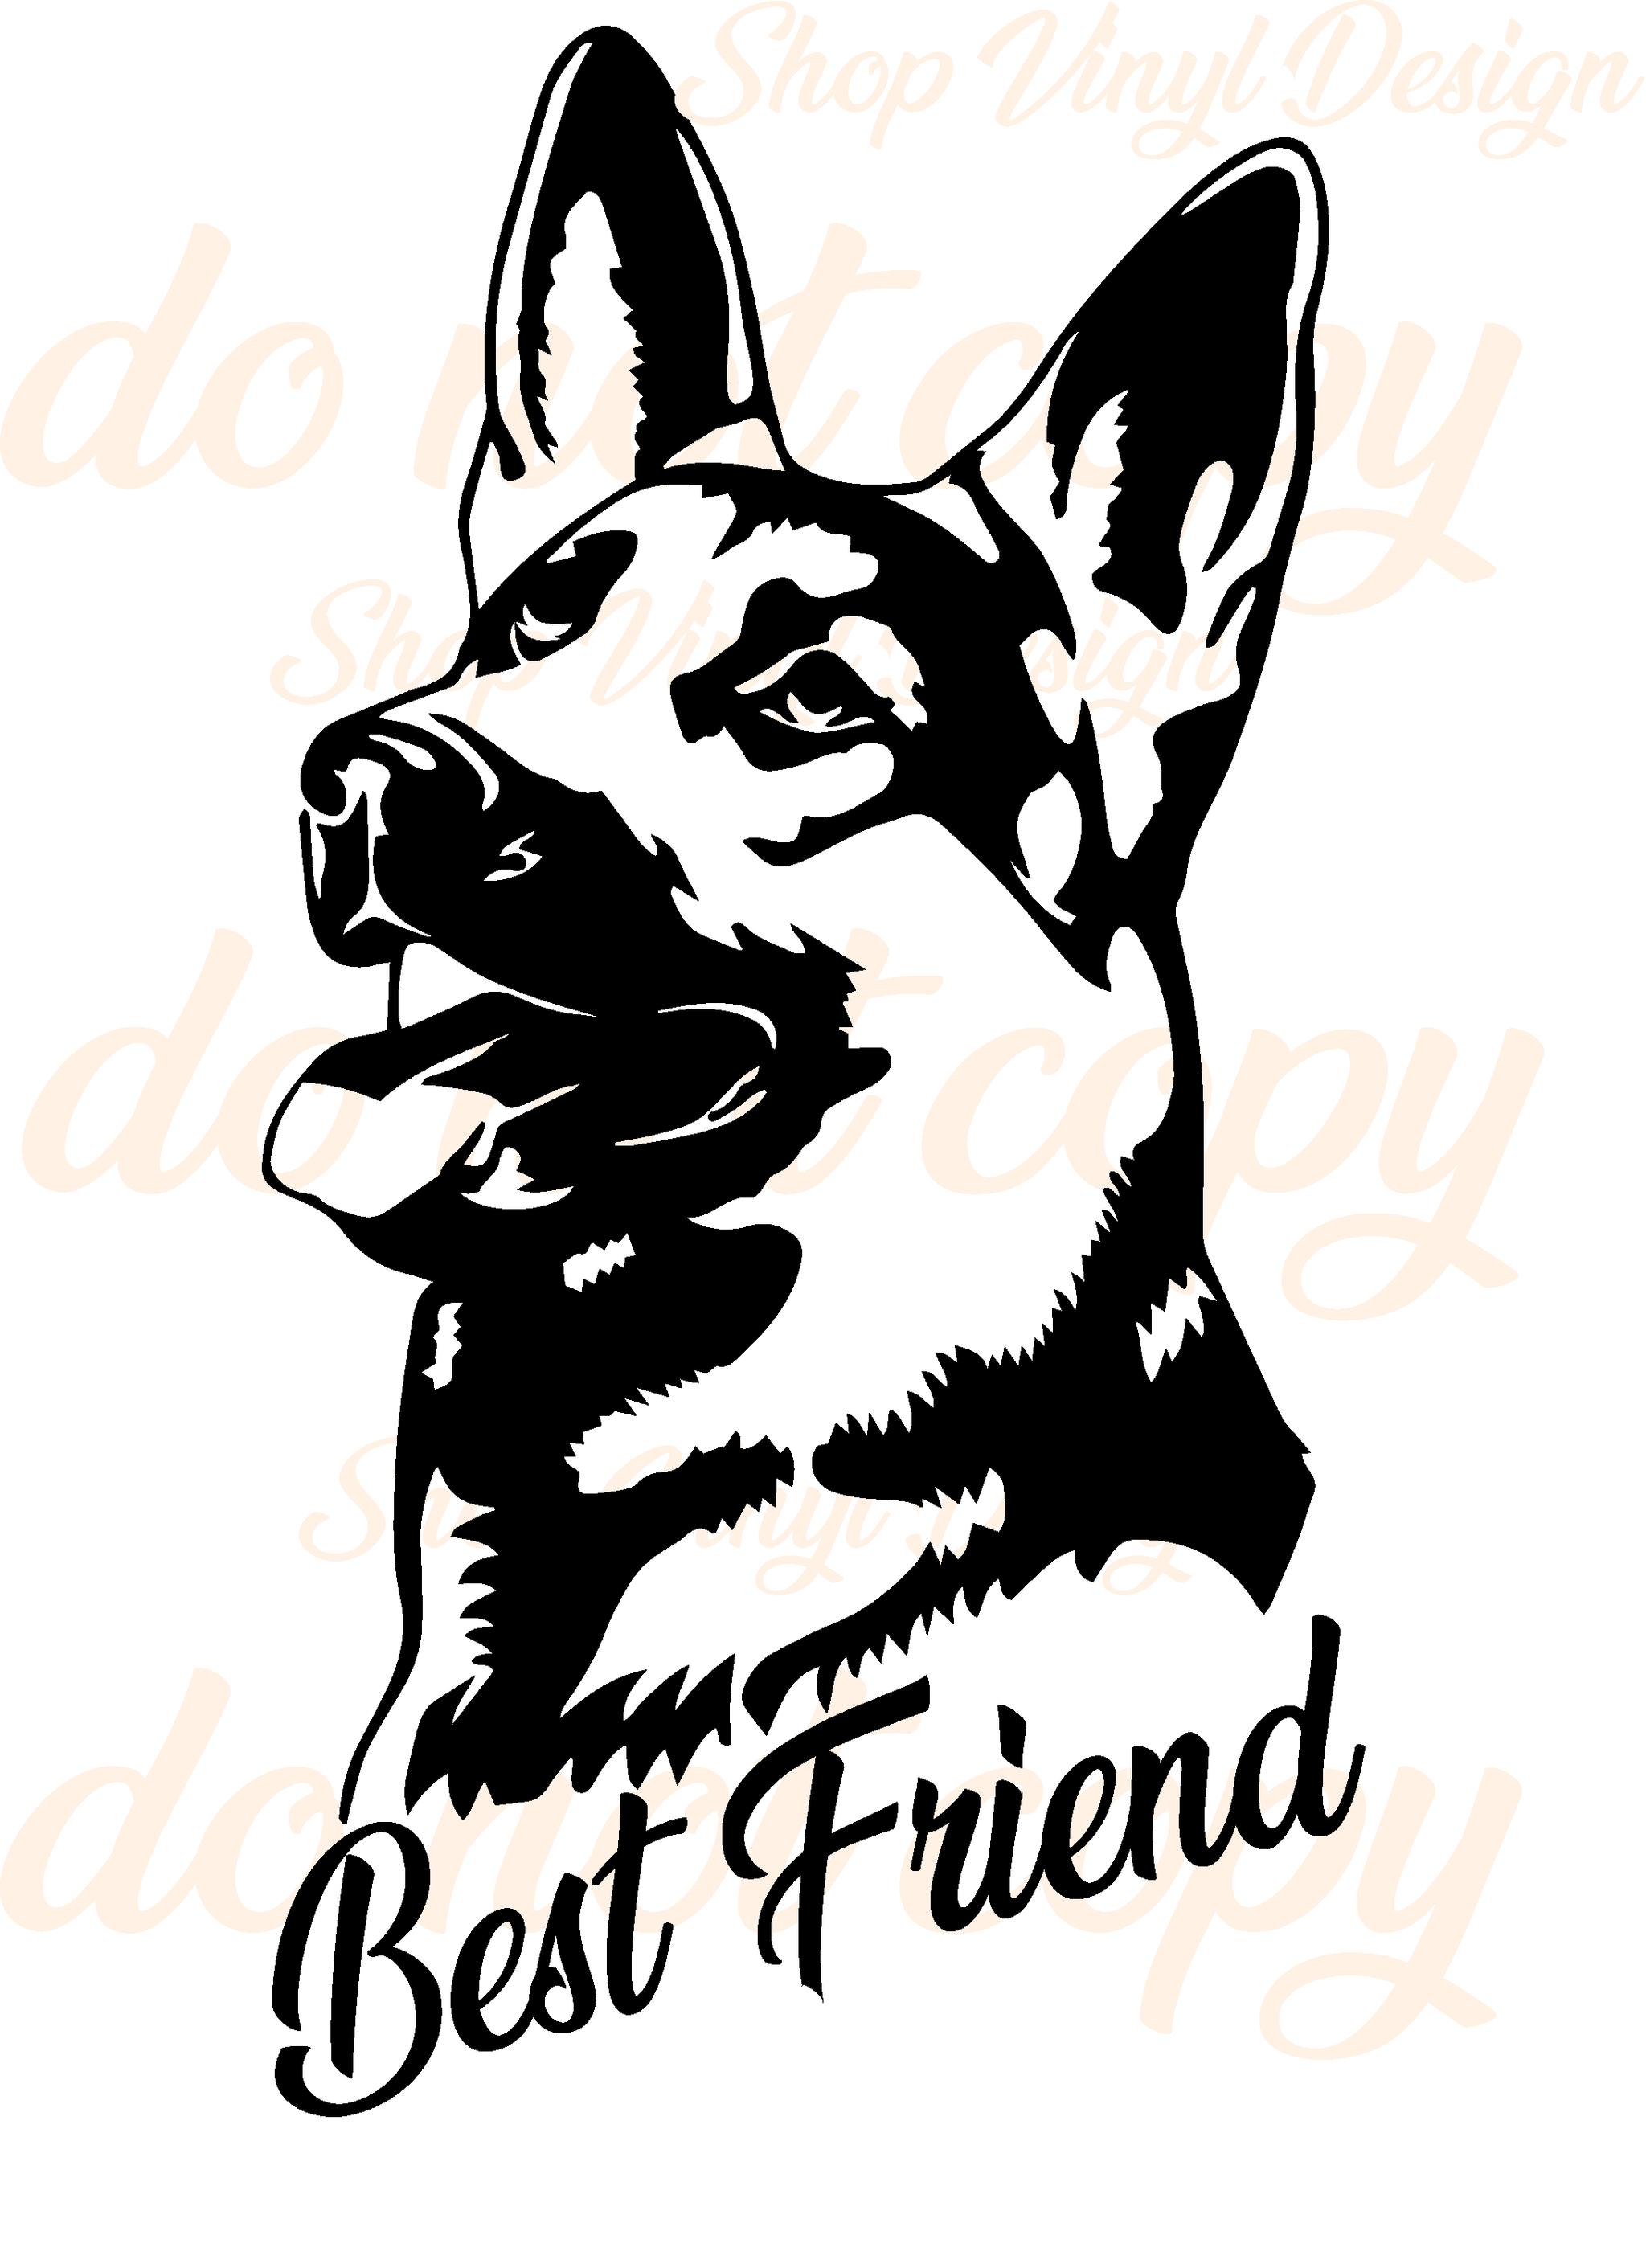 Best Friend German Shepard Vinyl Graphic Decal Vinyl Graphic Decal